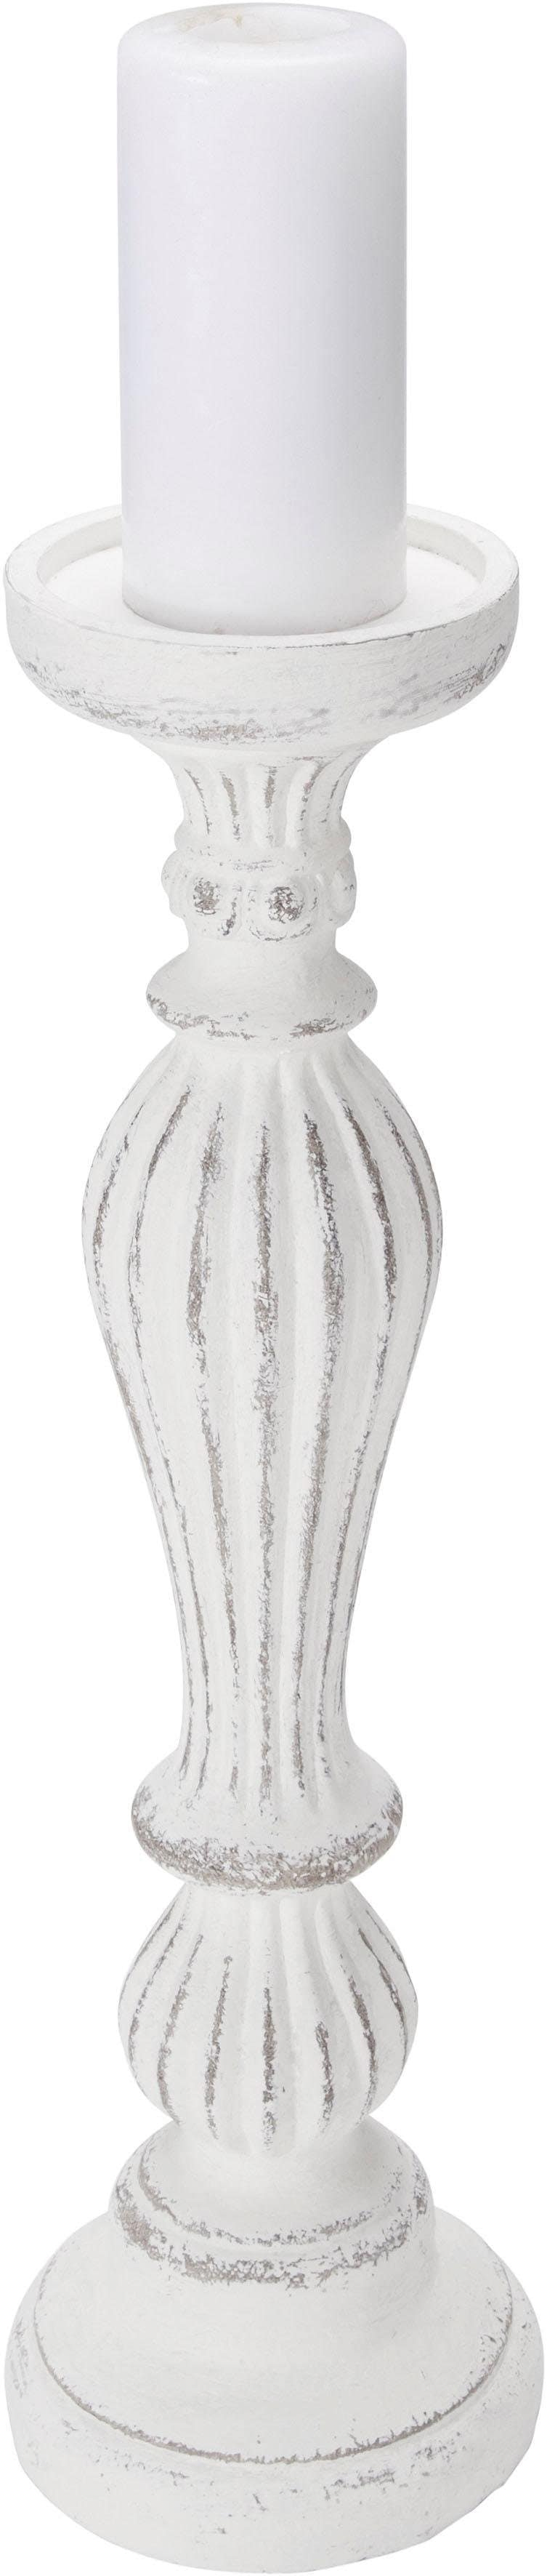 Home affaire Kerzenhalter, im Antik-Look weiß Kerzenhalter Kerzen Laternen Wohnaccessoires